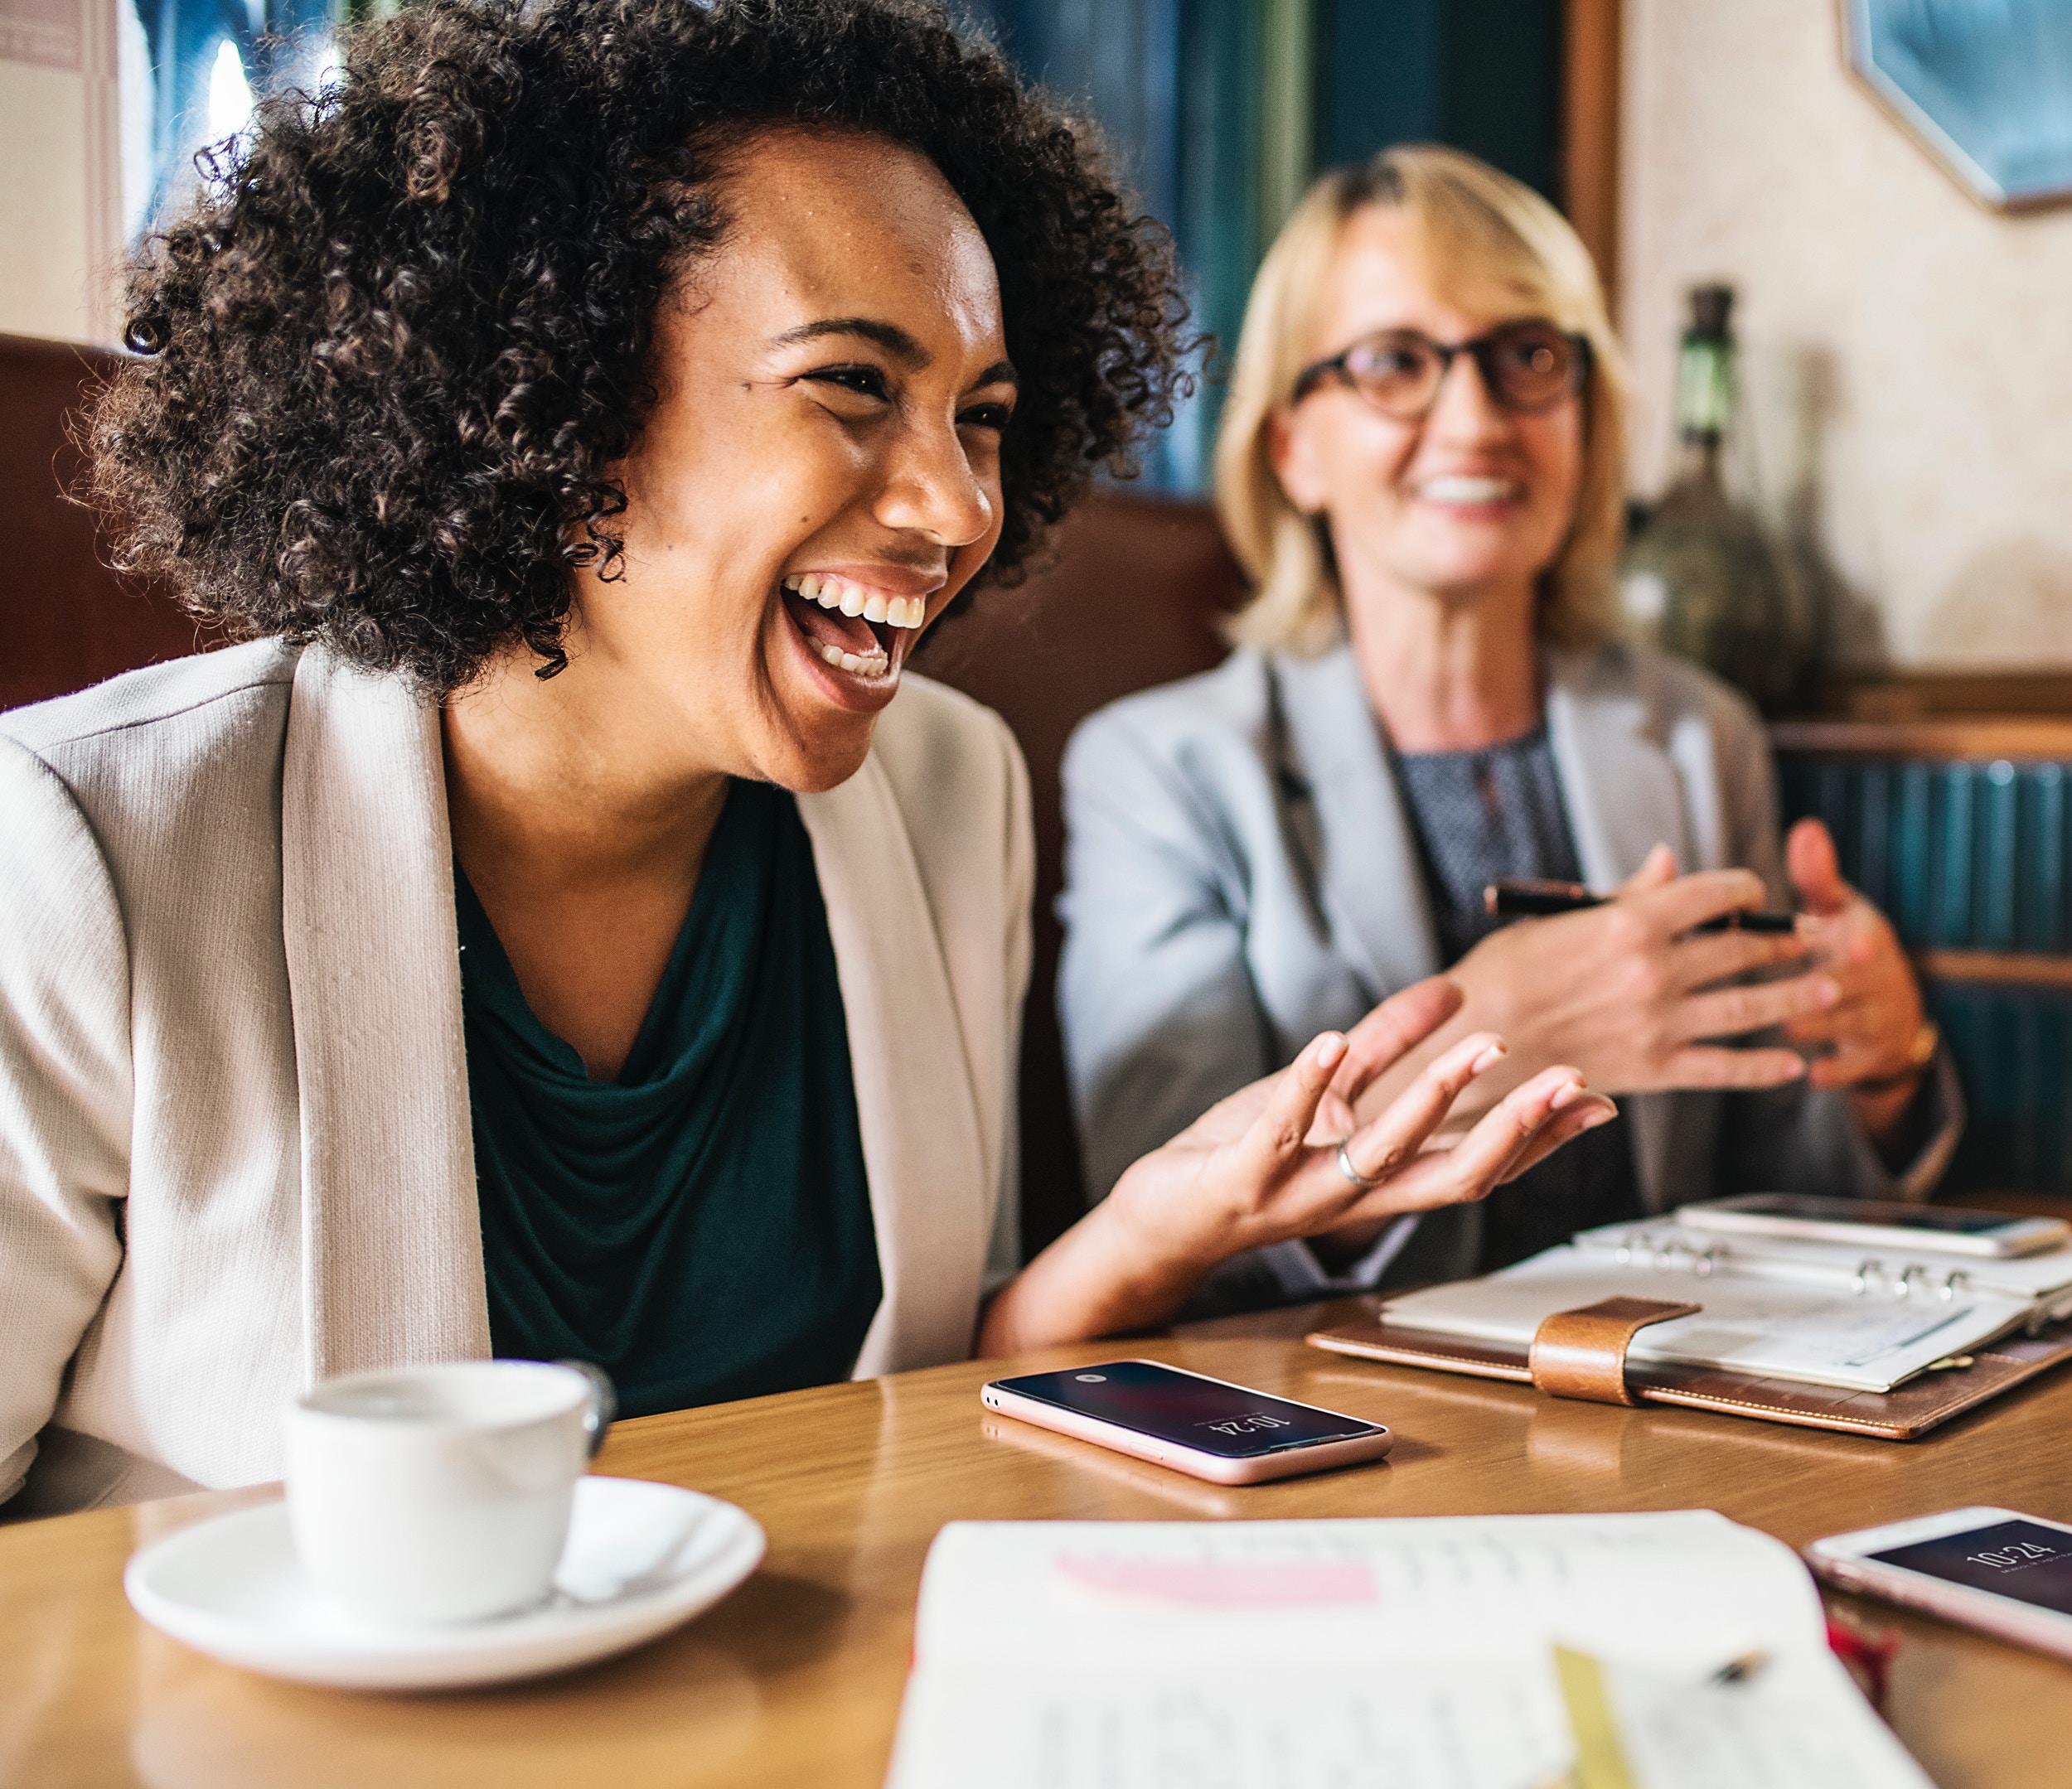 Business Lunch Conversation Topics